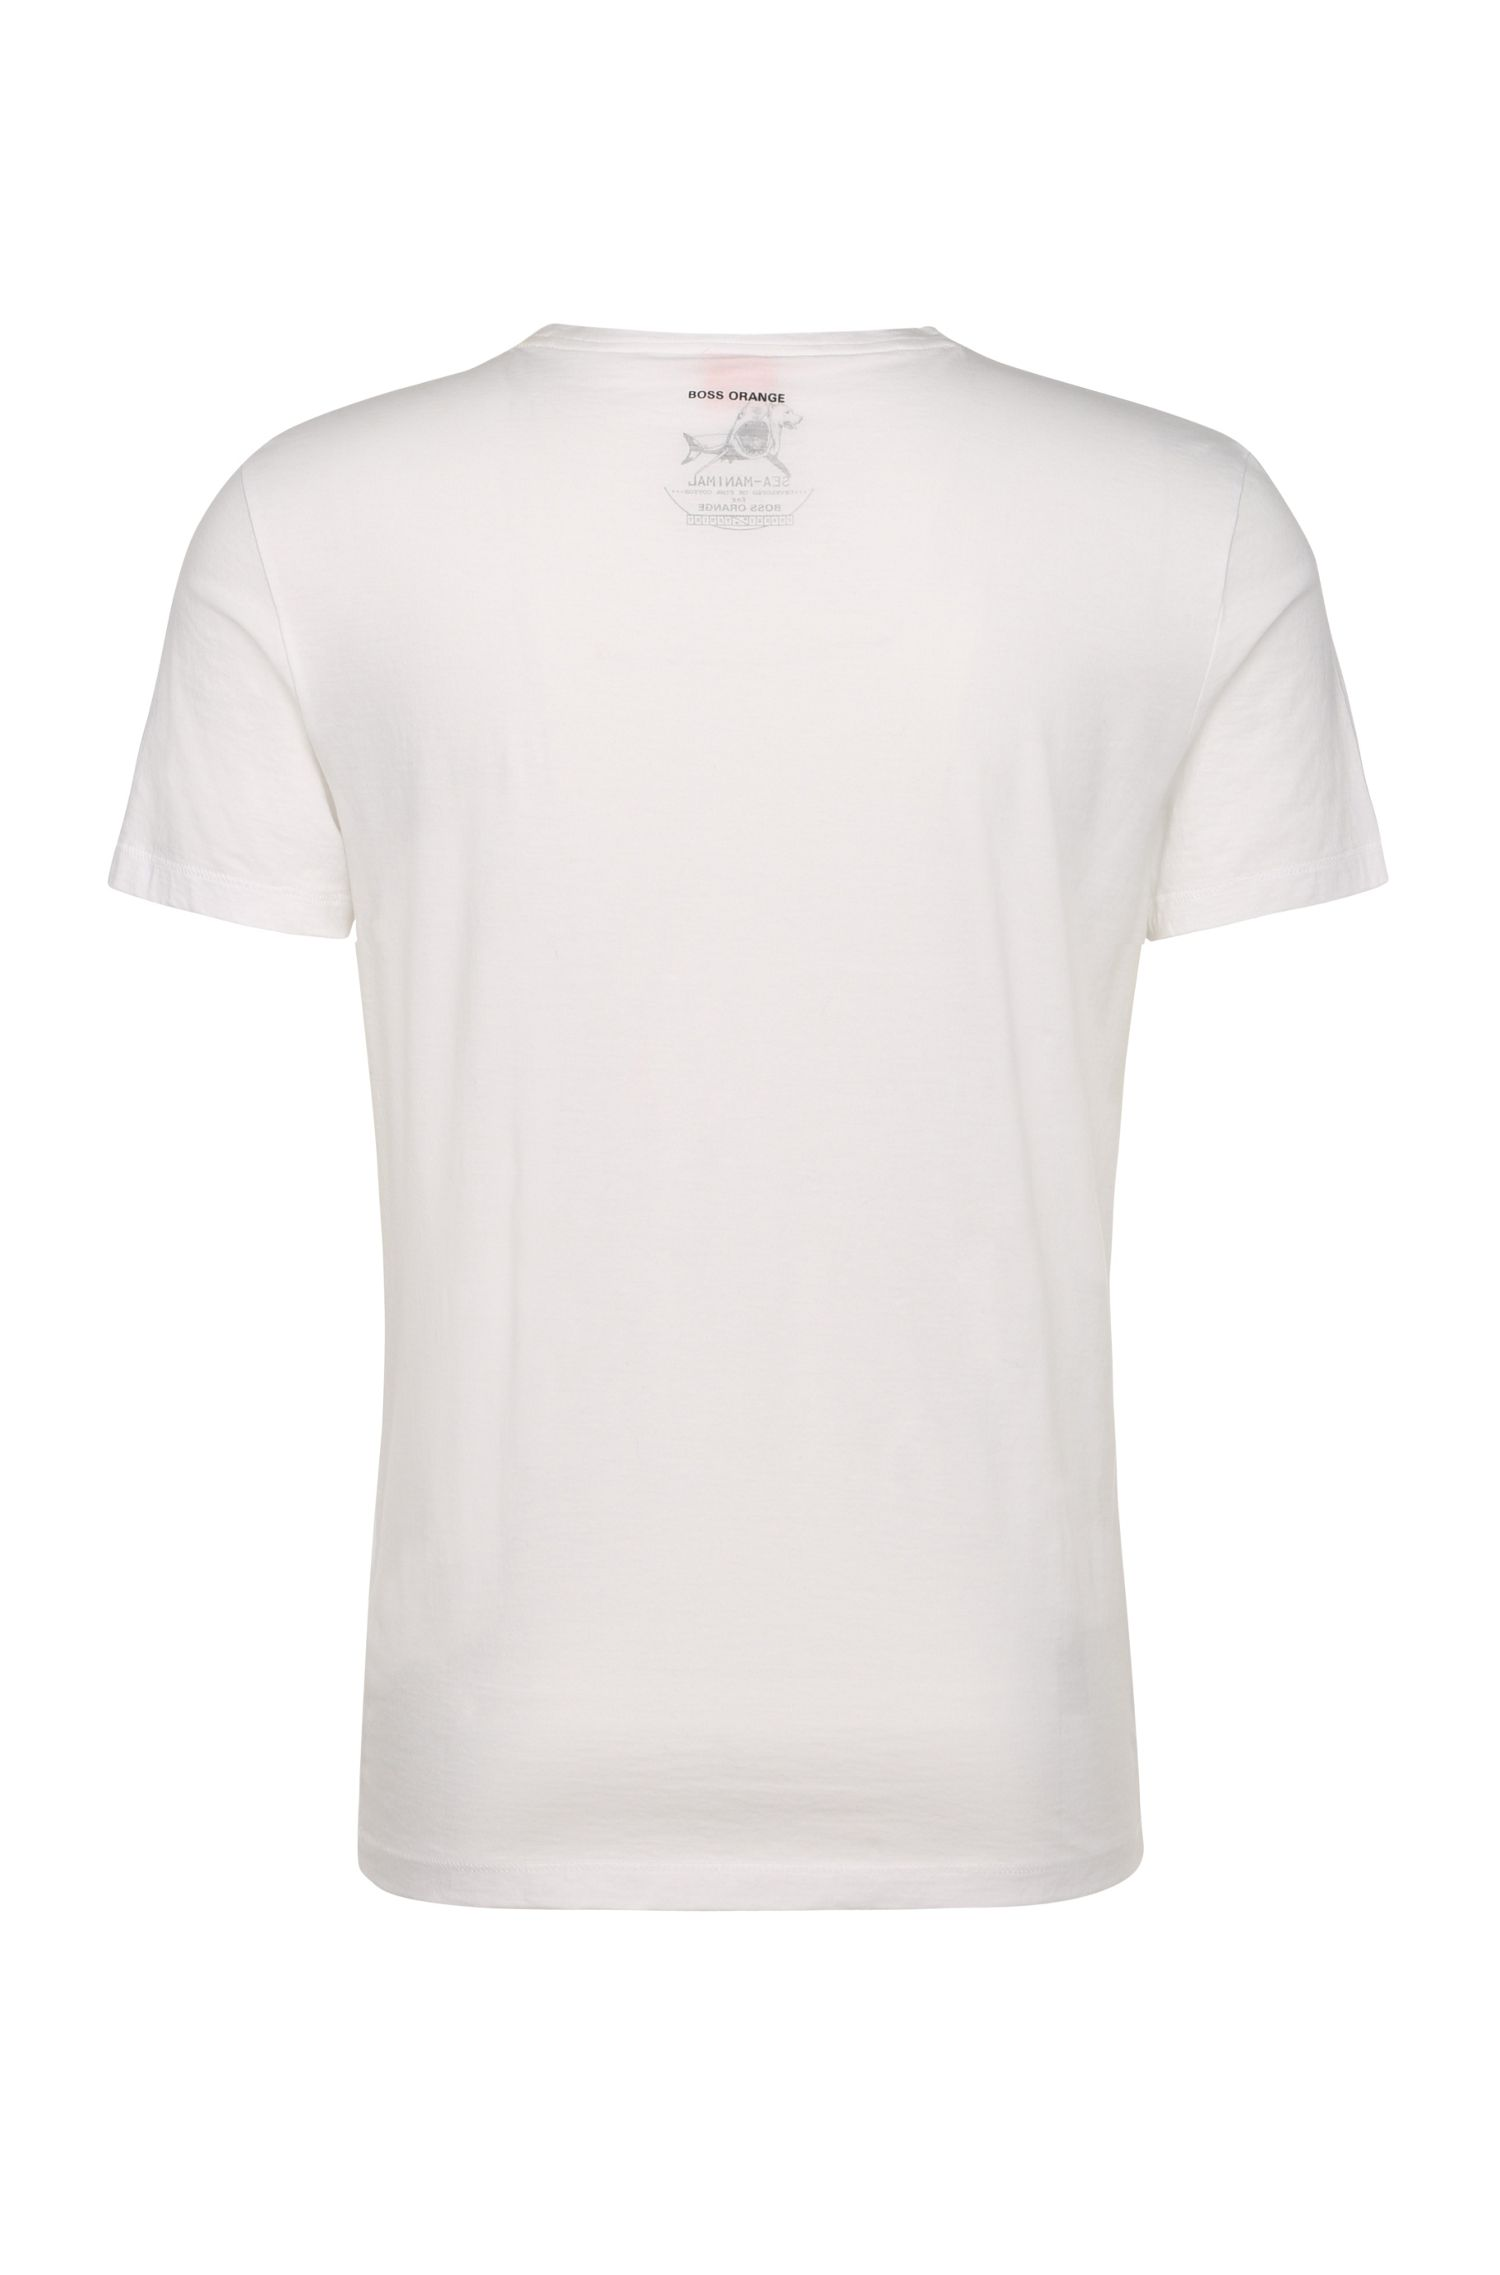 Print-Shirt aus Pima-Baumwolle: ´Treyno 1`